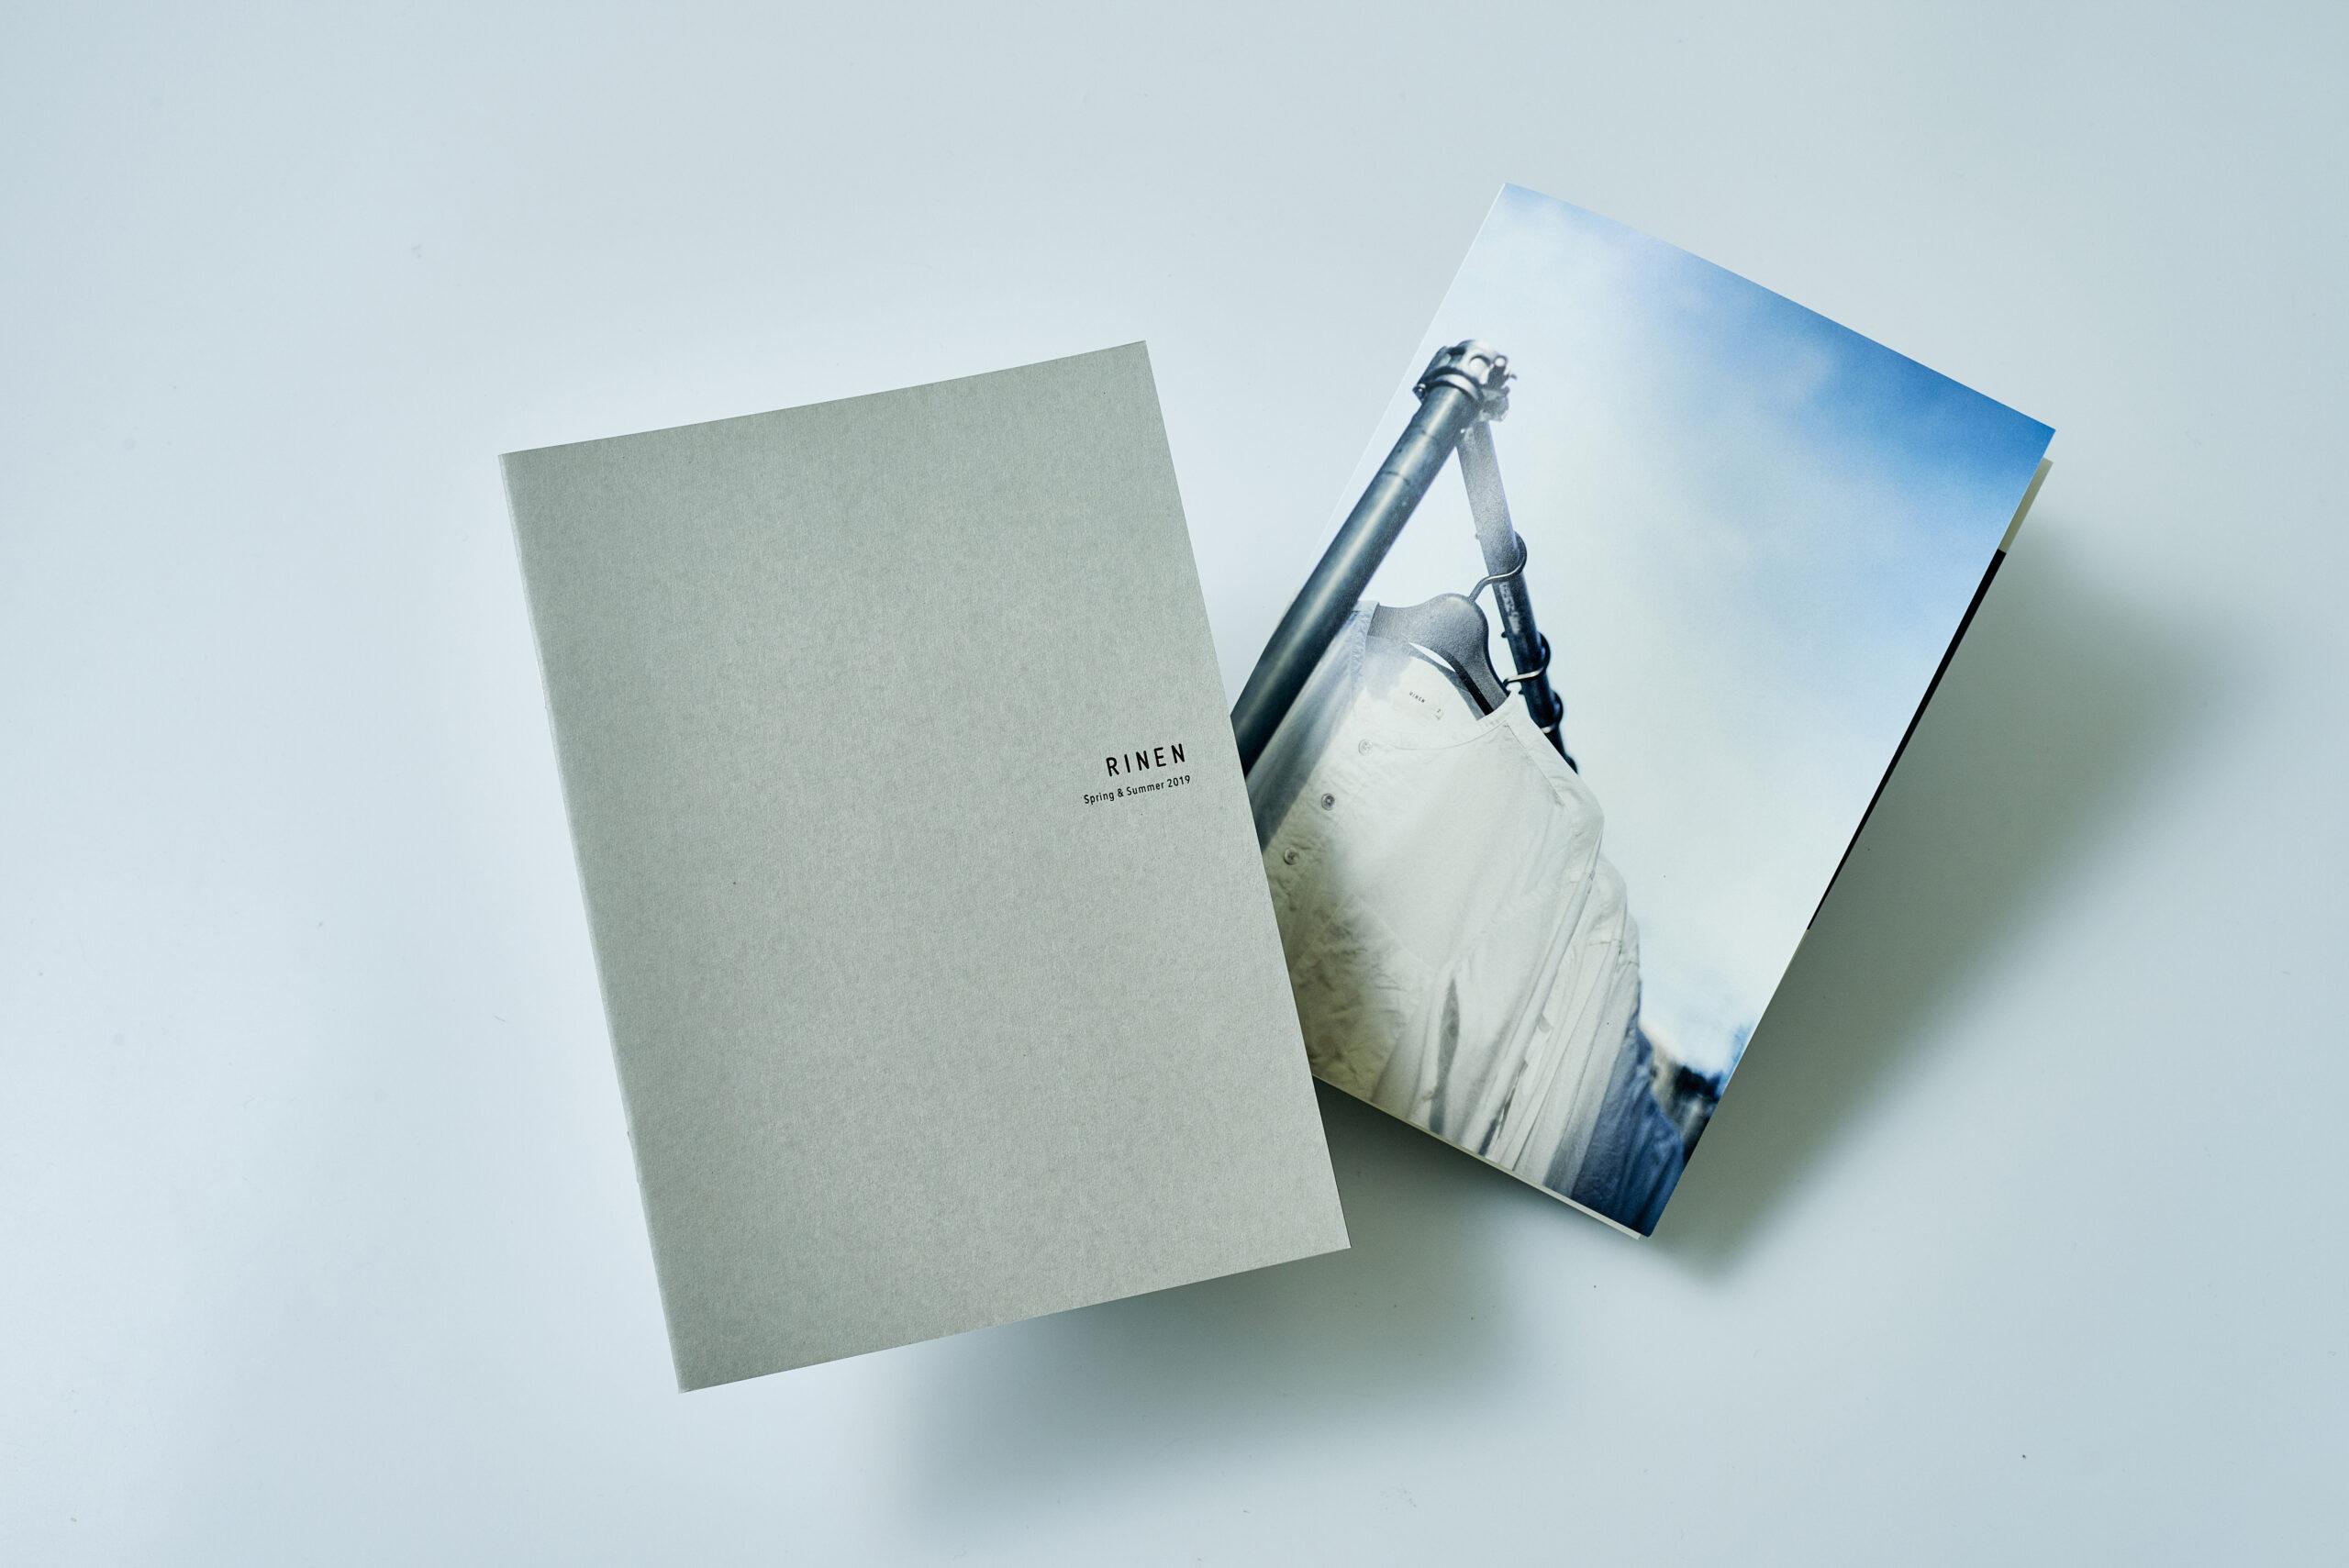 048rinen_catalog